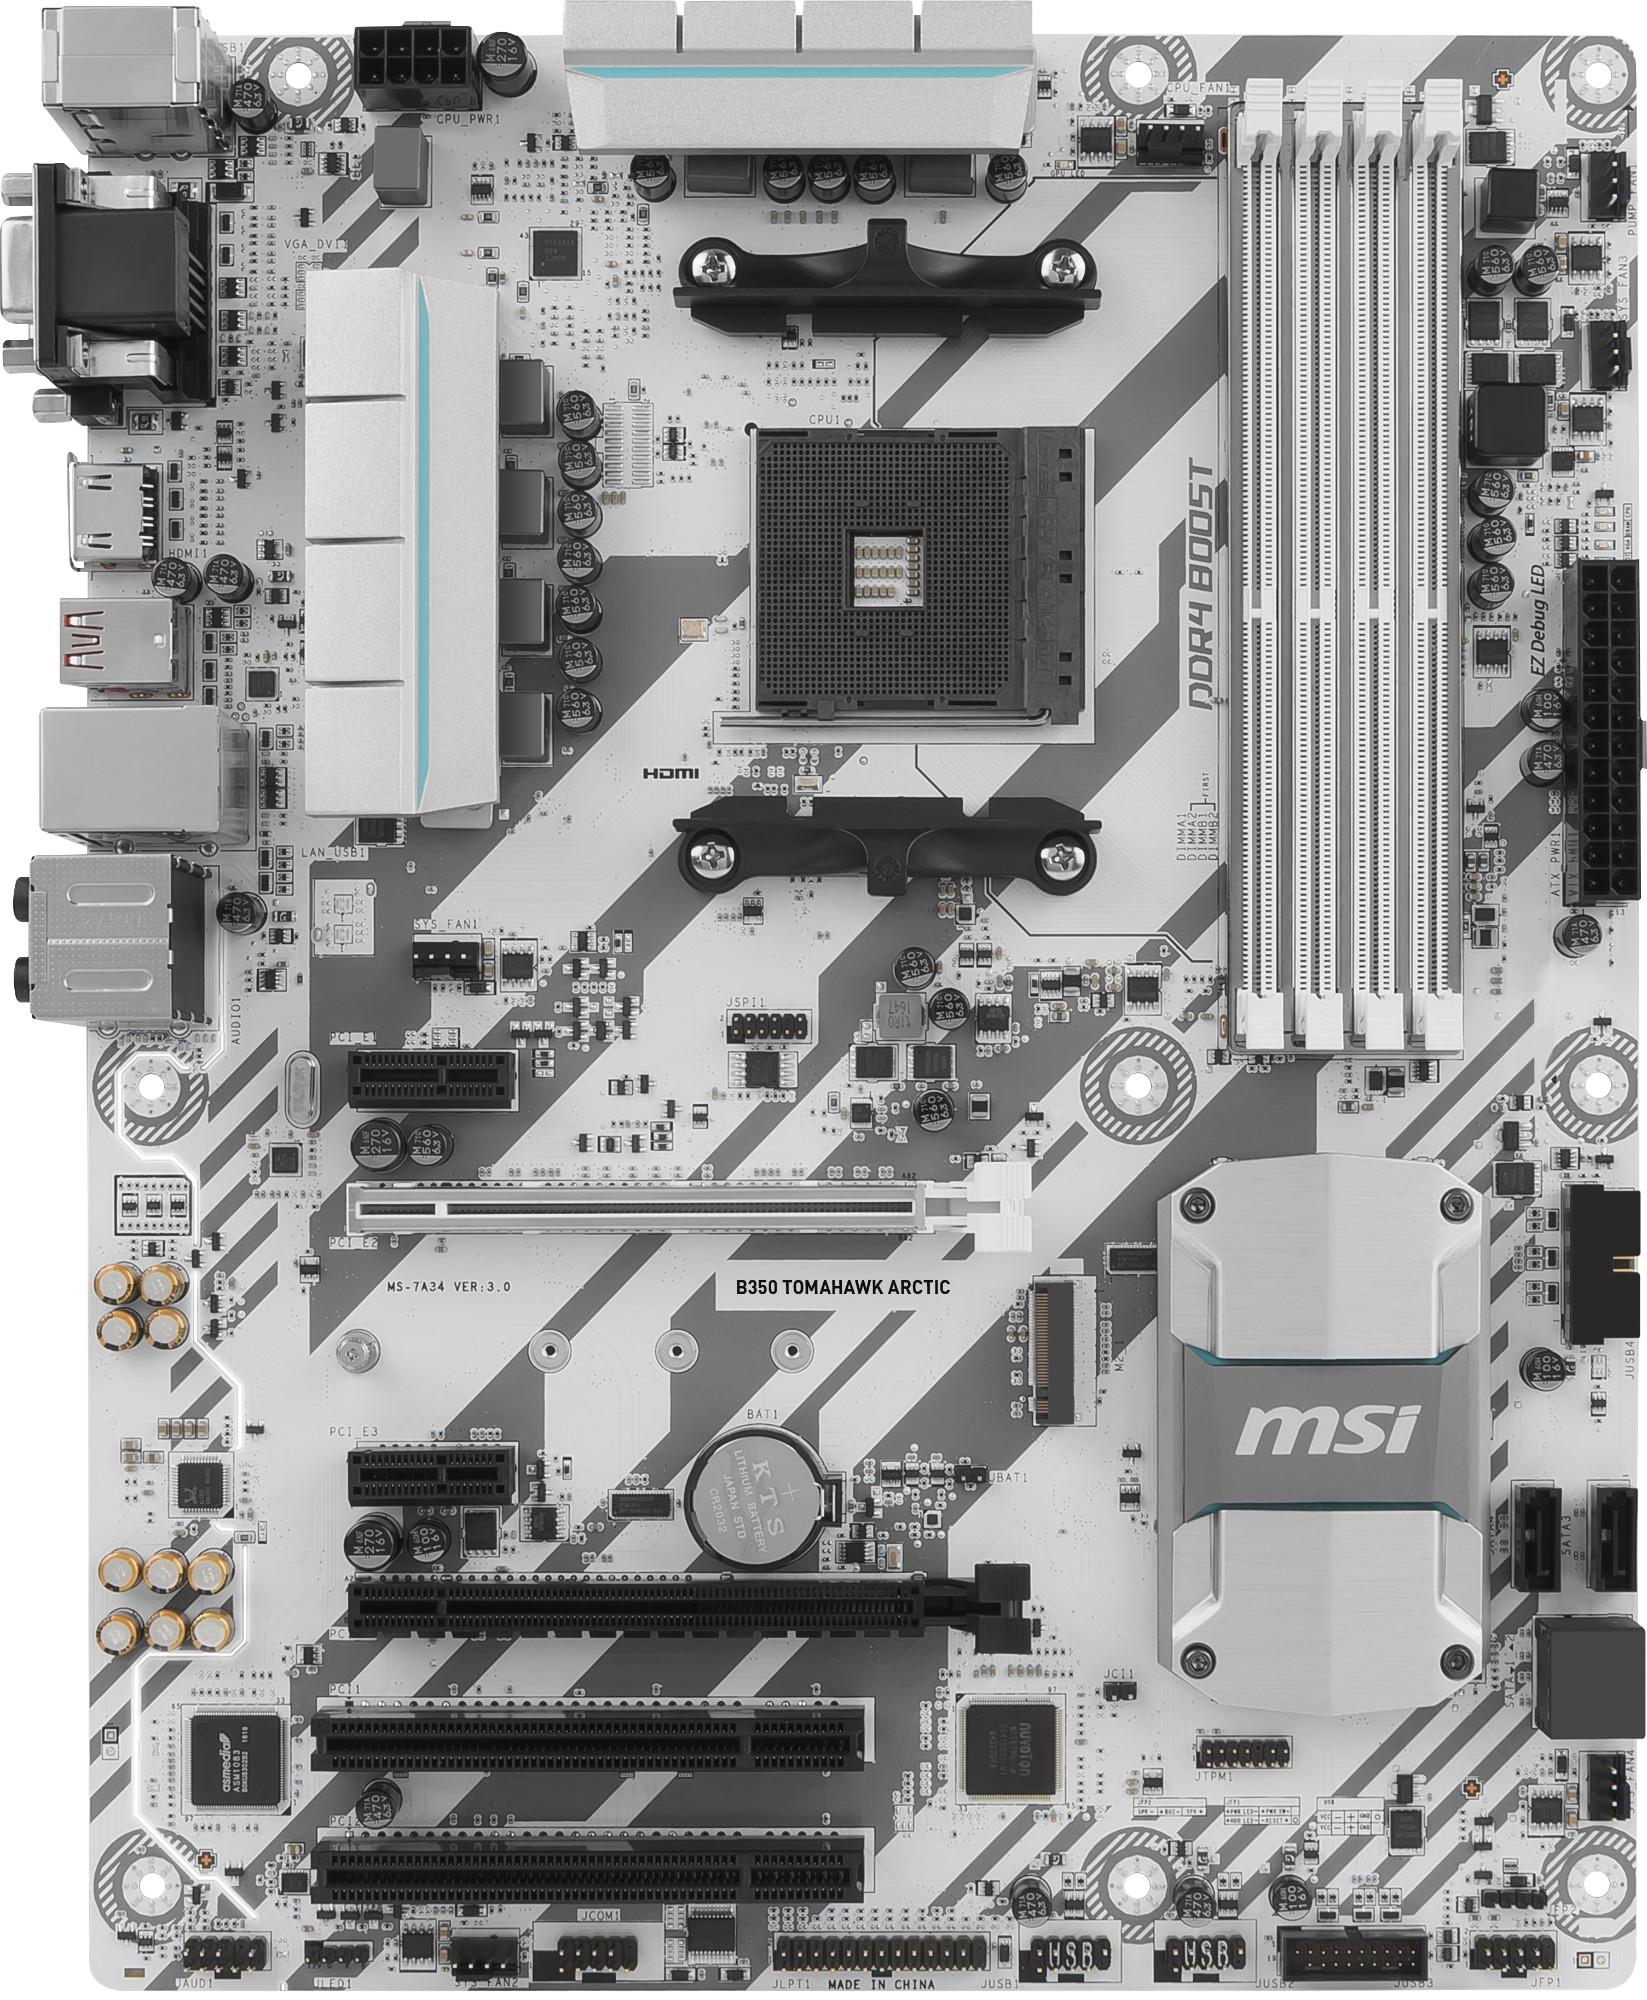 MSI B350 TOMAHAWK ARCTIC AMD B350 Socket AM4 ATX